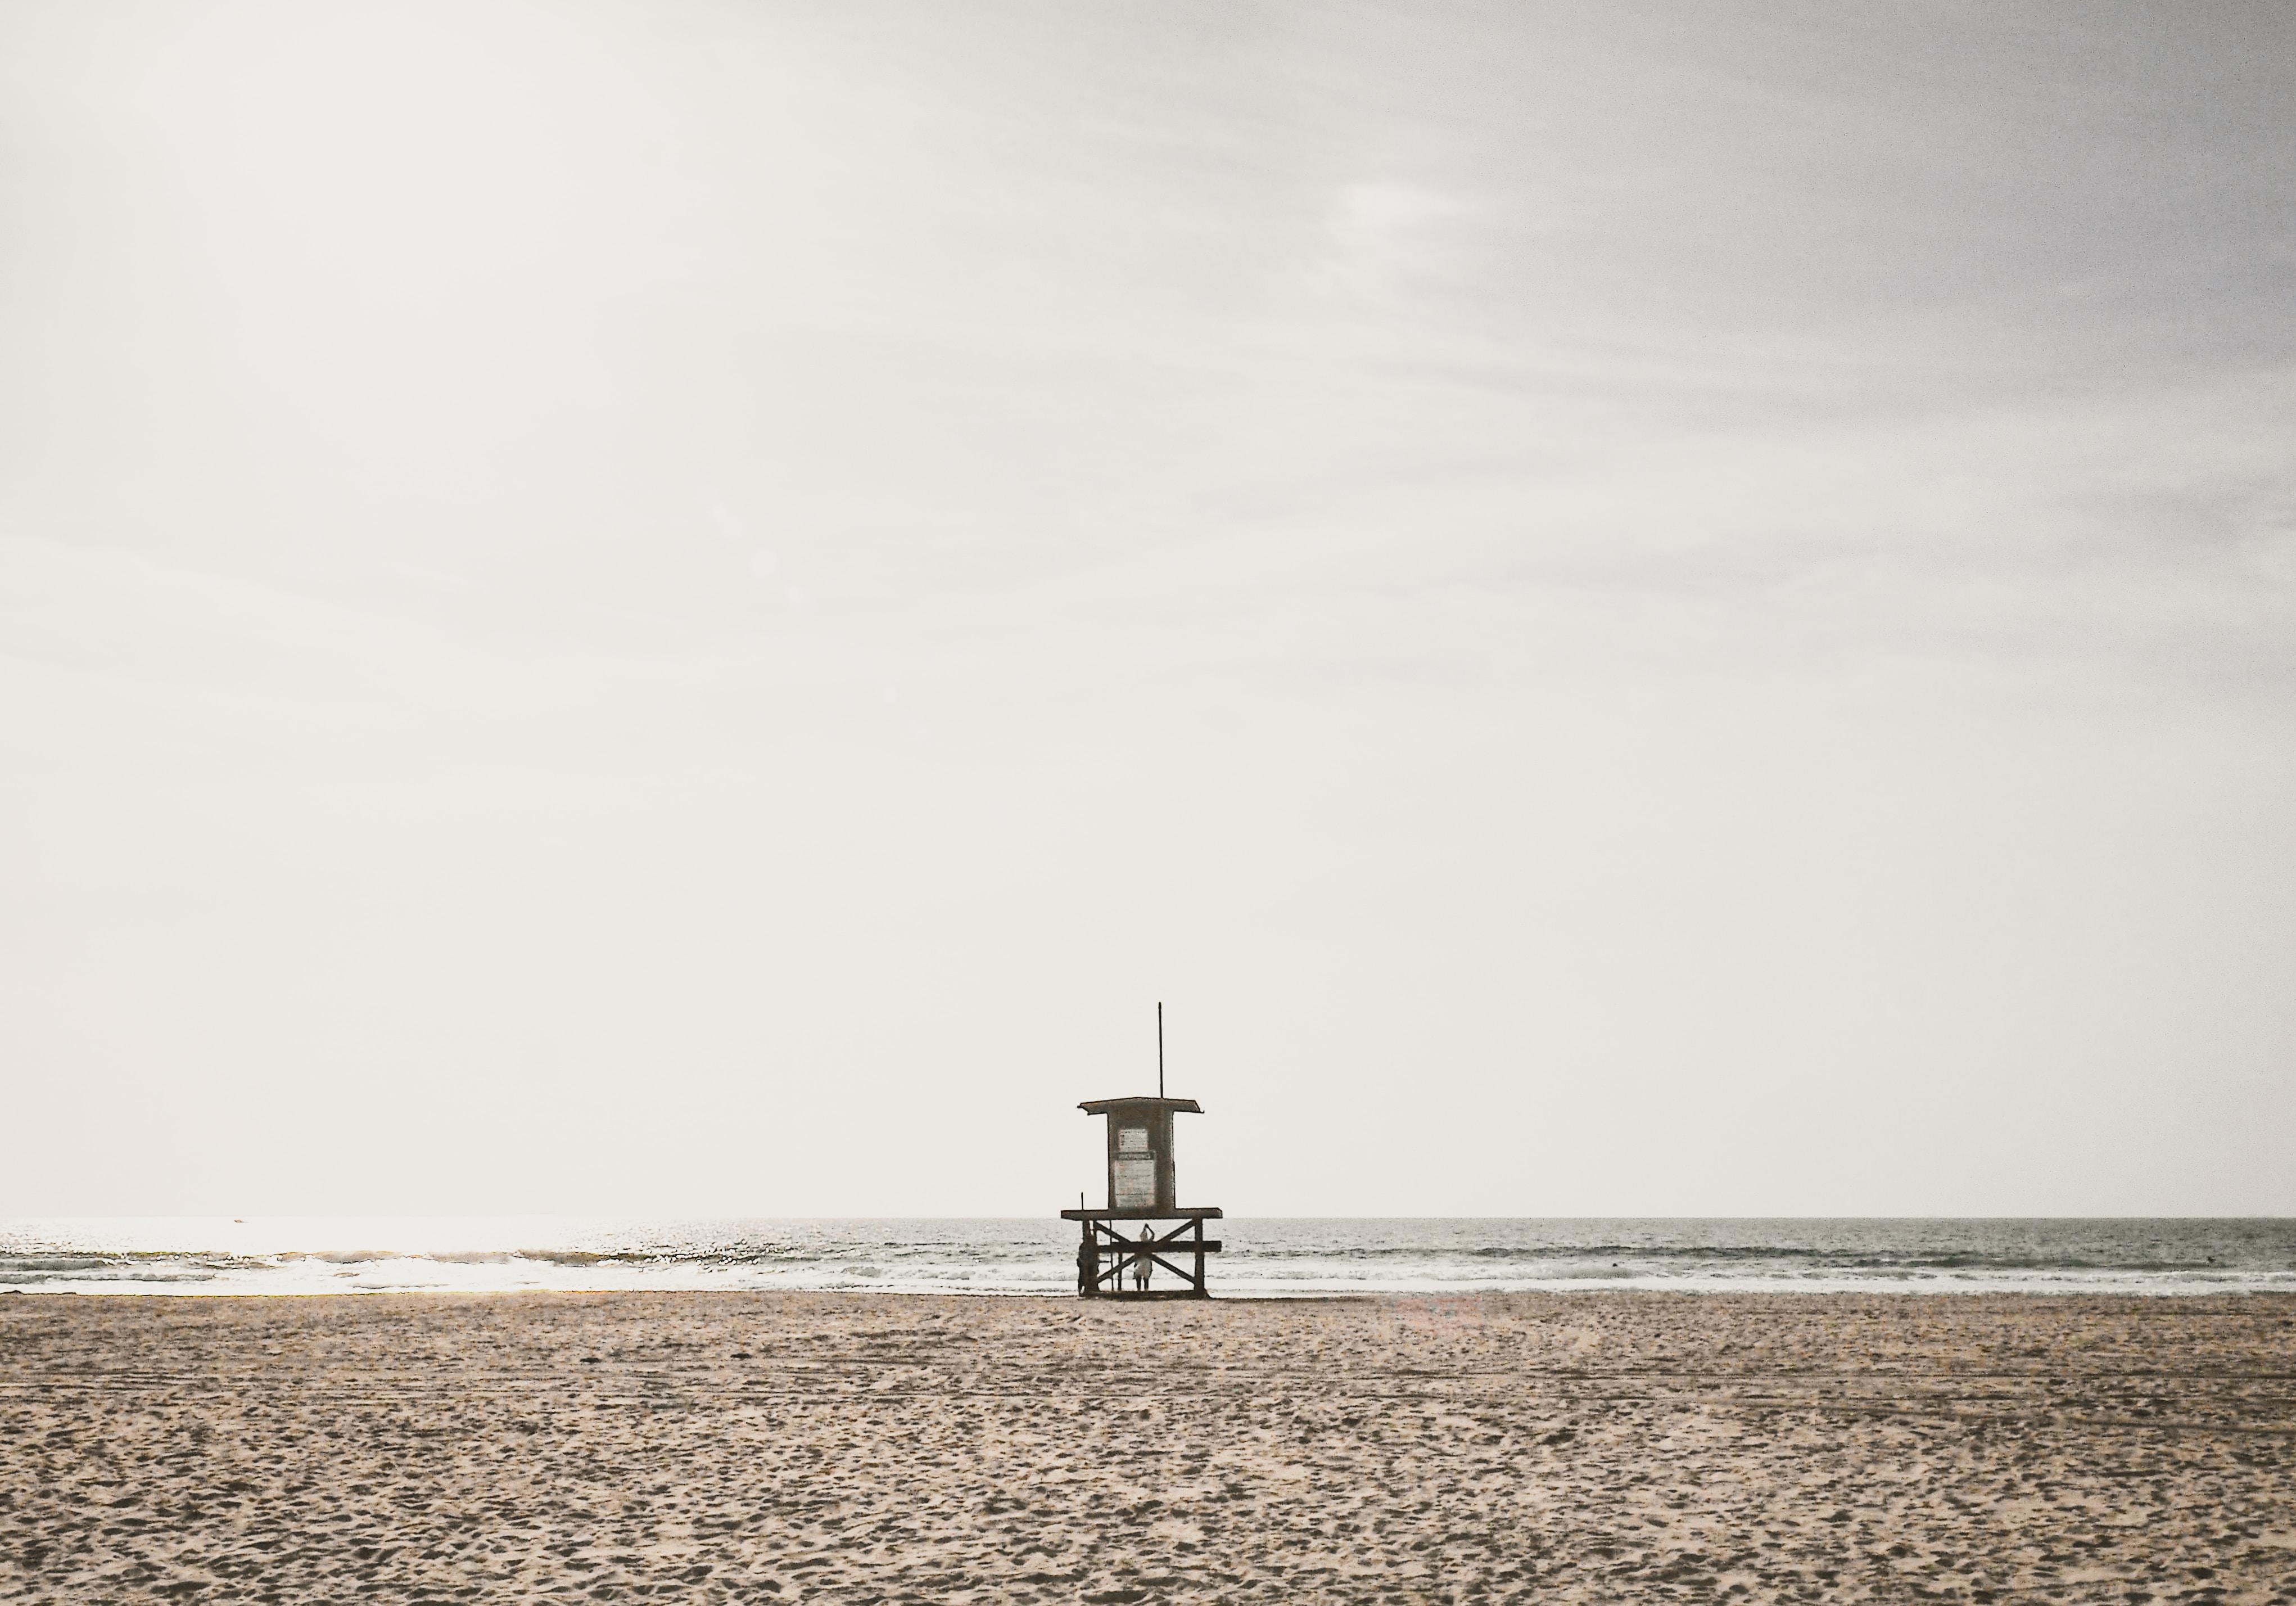 photo of lifeguard station near shoreline